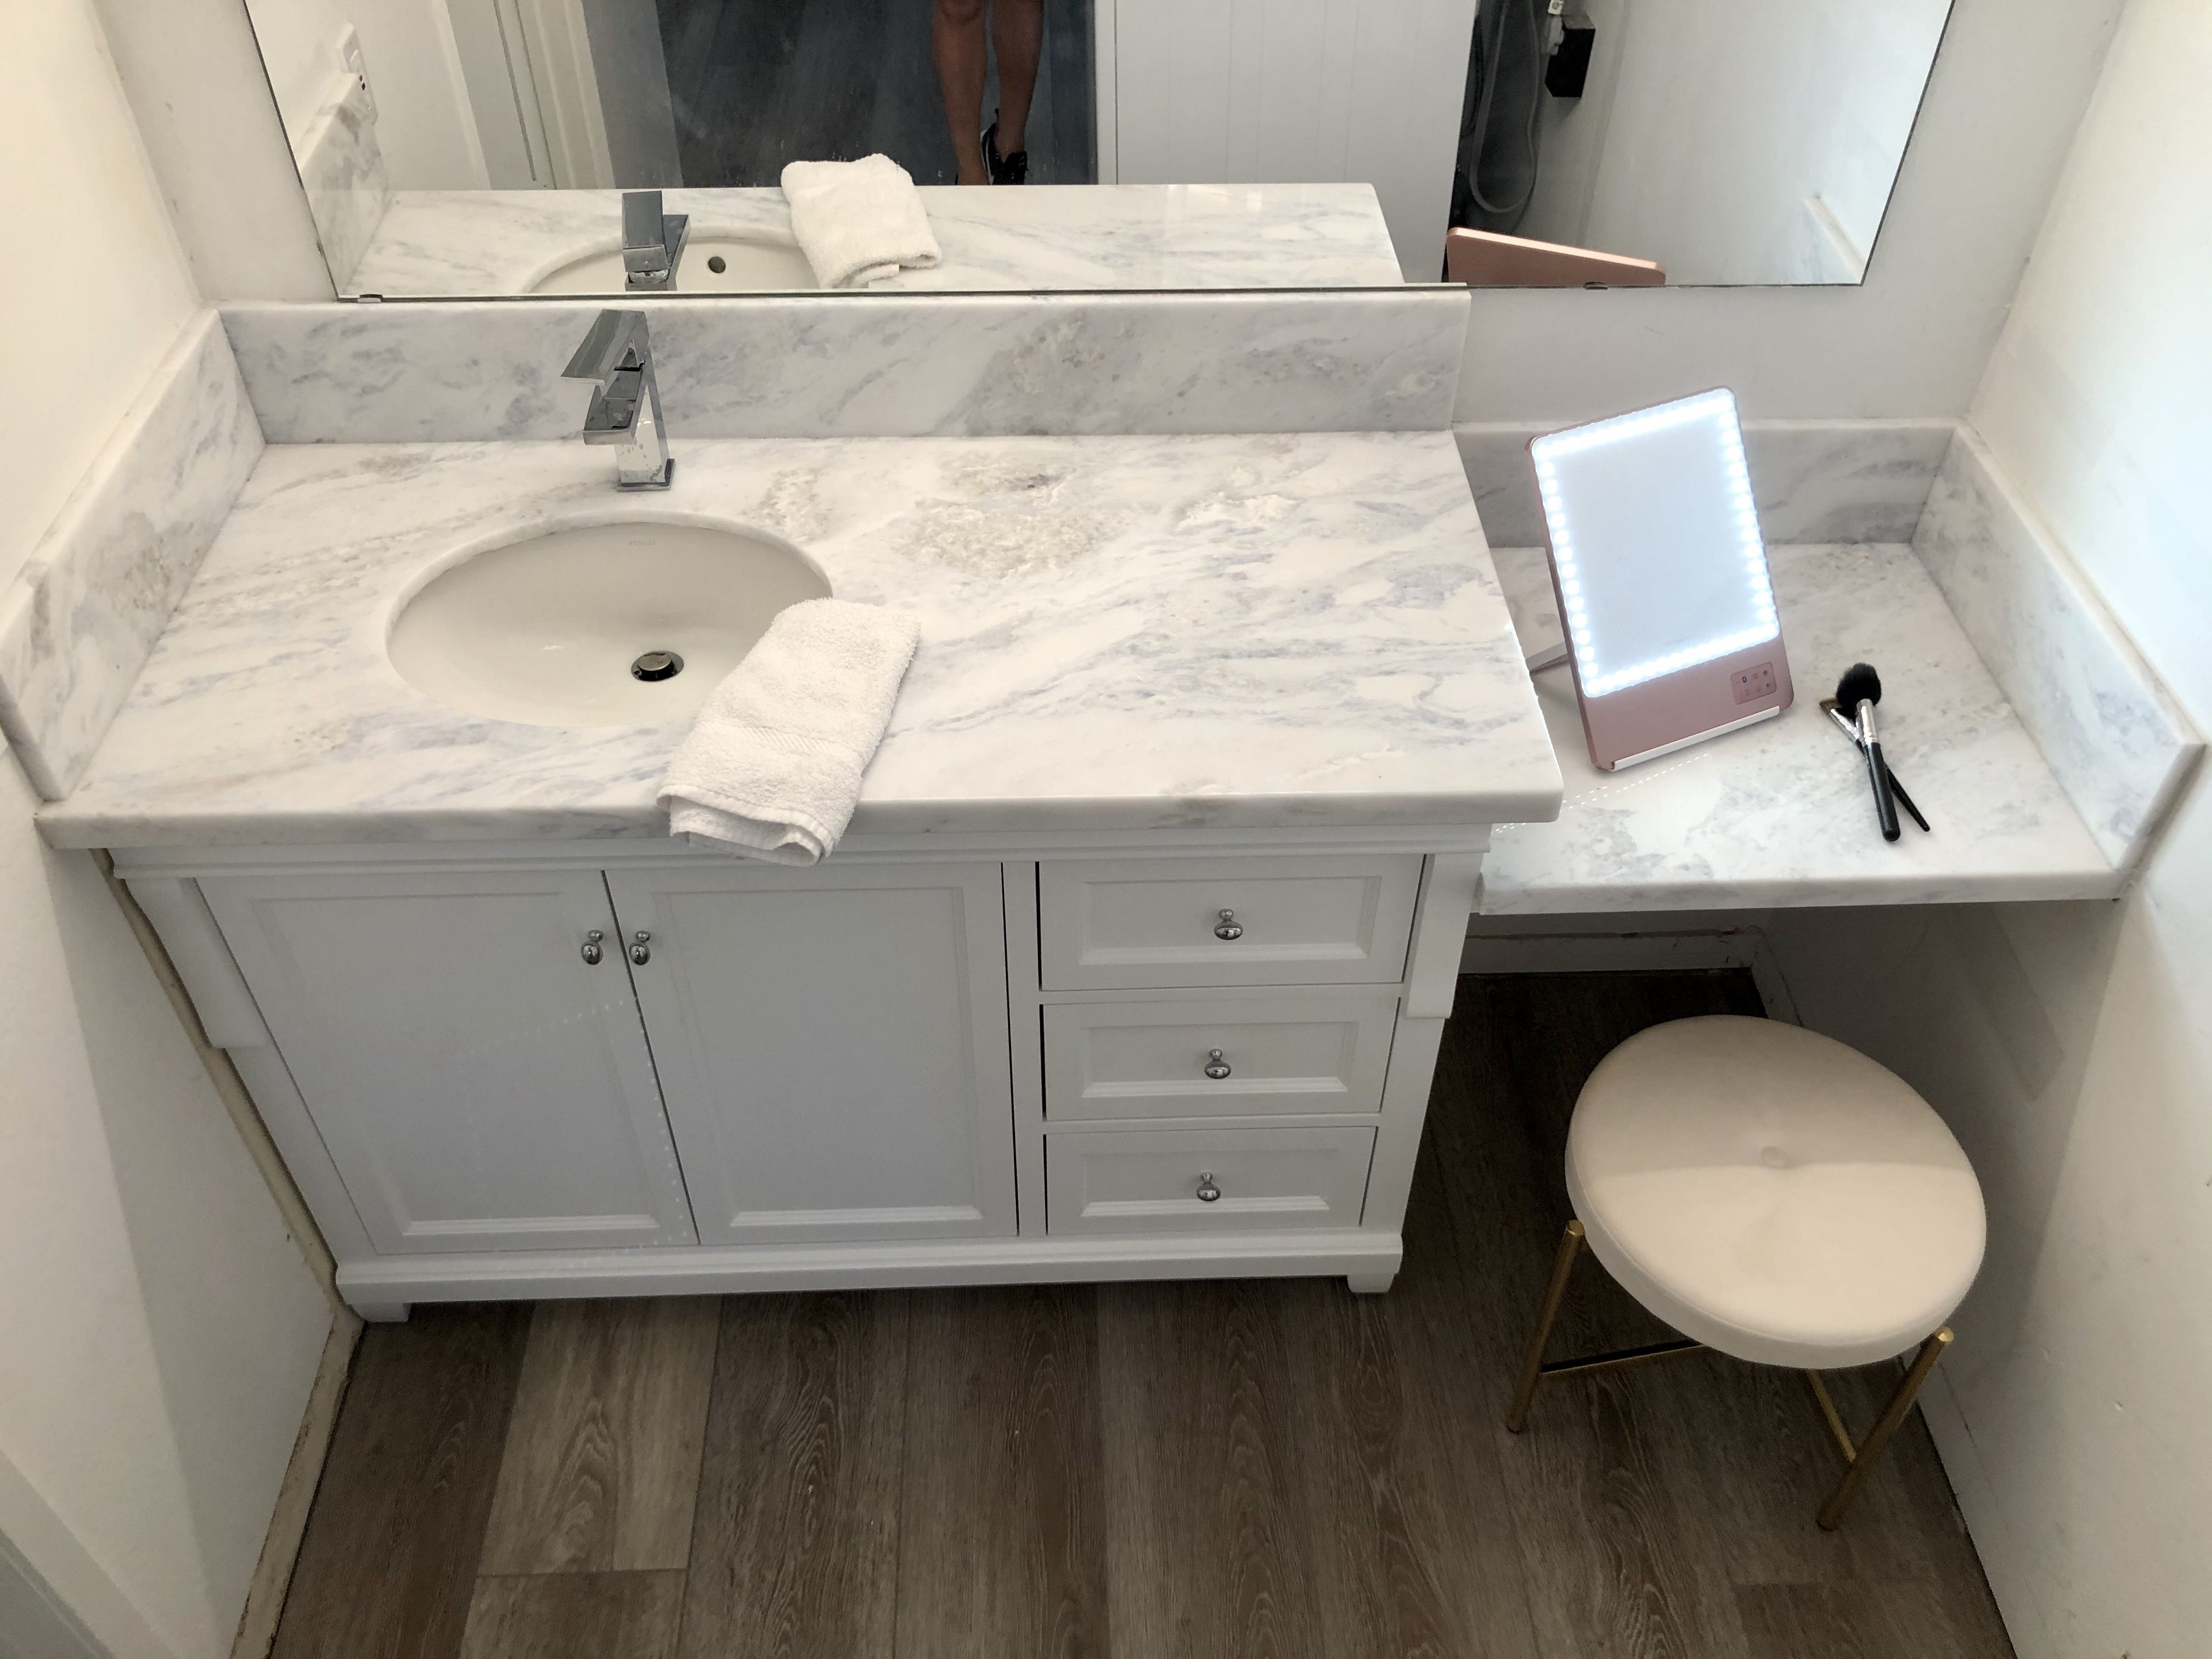 Photo of Bathroom Vanity with Make-up area